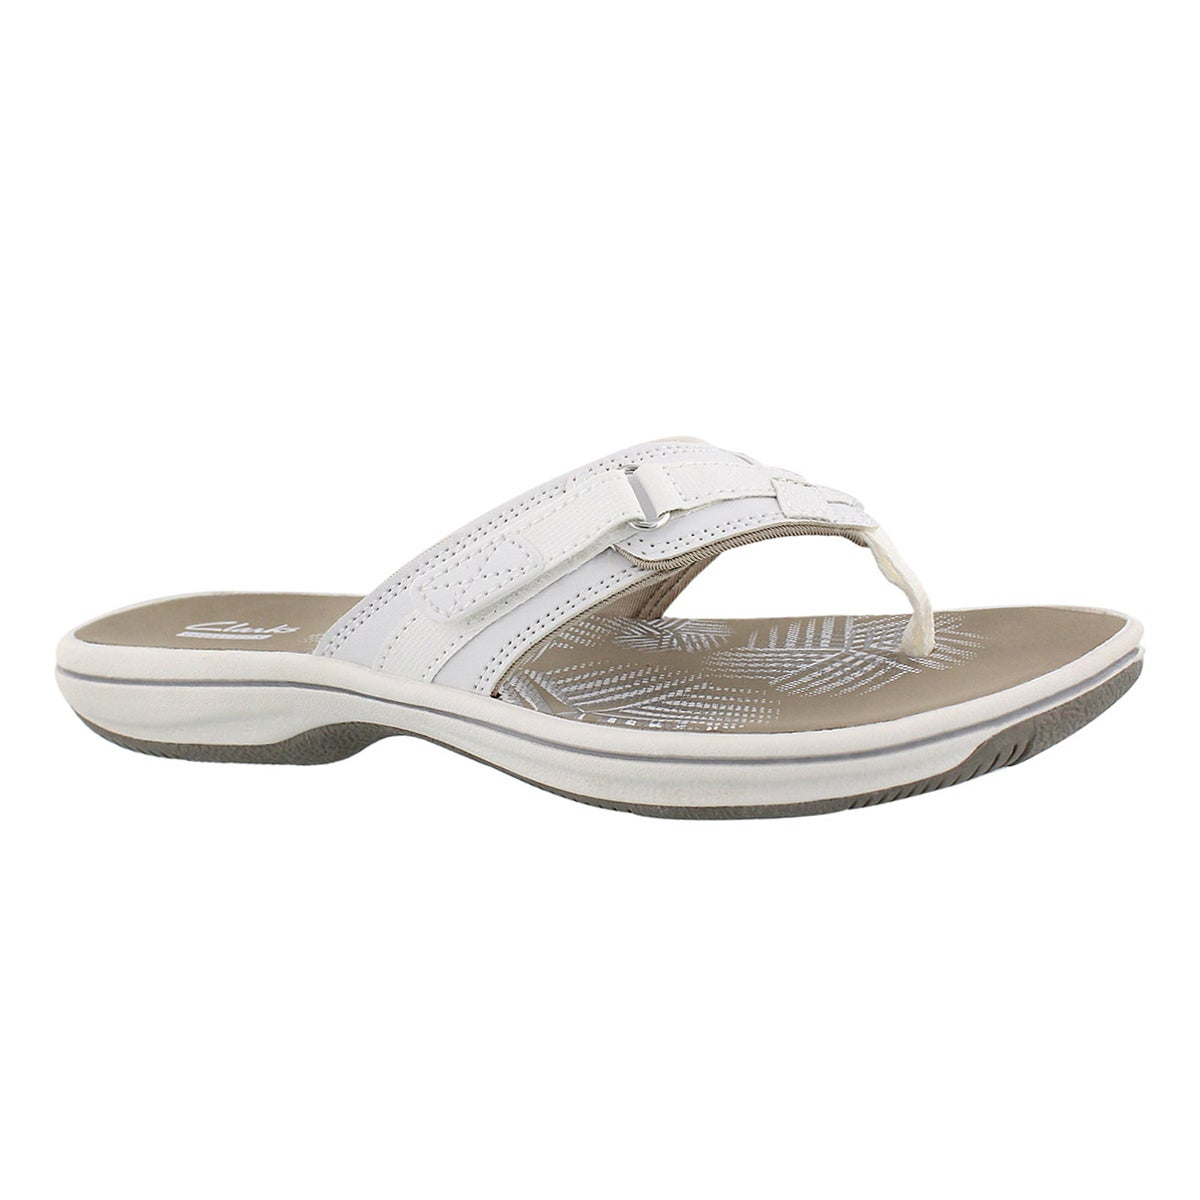 Lds Breeze Sea white thong sandal